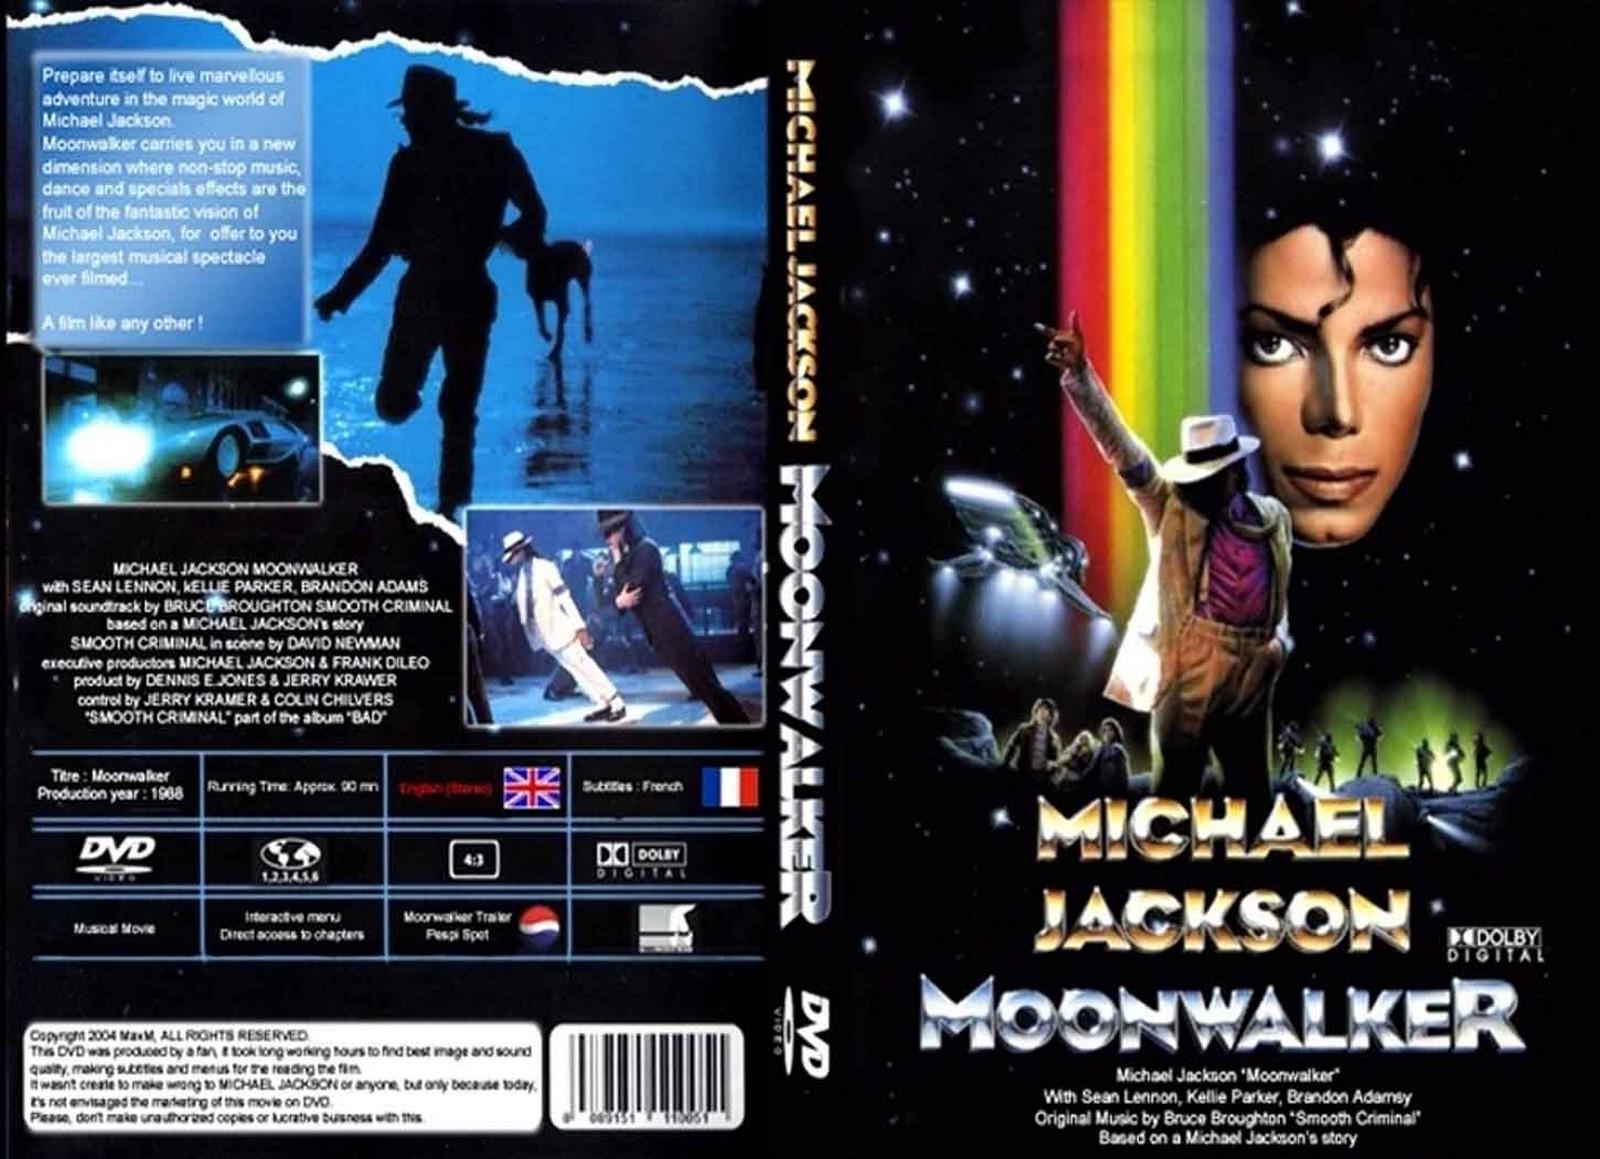 http://1.bp.blogspot.com/-ZnPYPLgUFvc/TbhFxUOkKwI/AAAAAAAAAAo/PFS1bfSpmKs/s1600/michaeljackson-moonwalker.jpg